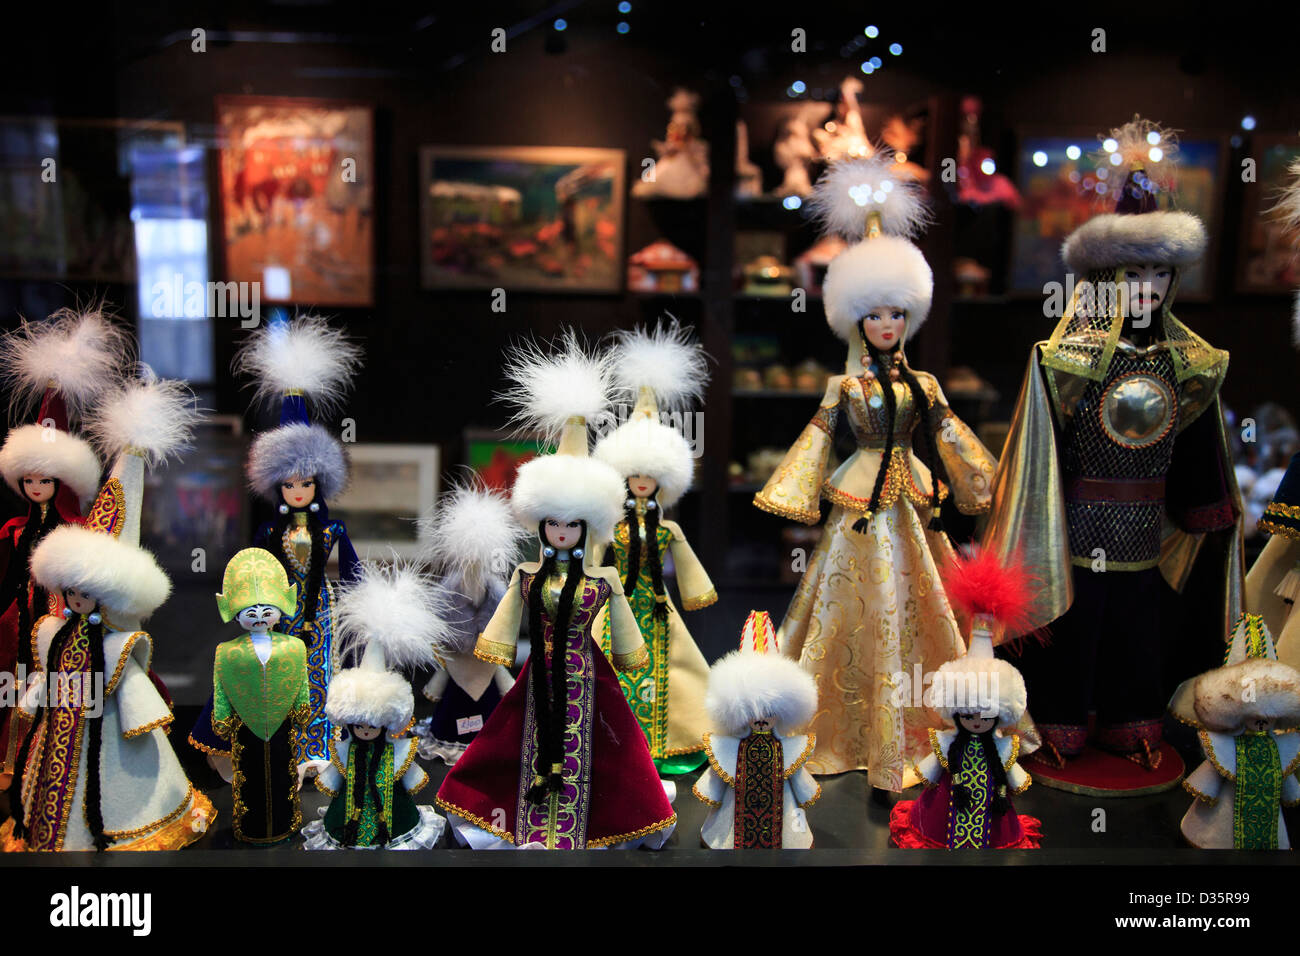 Ethnic Kazakh dolls in Astana, Kazakhstan - Stock Image